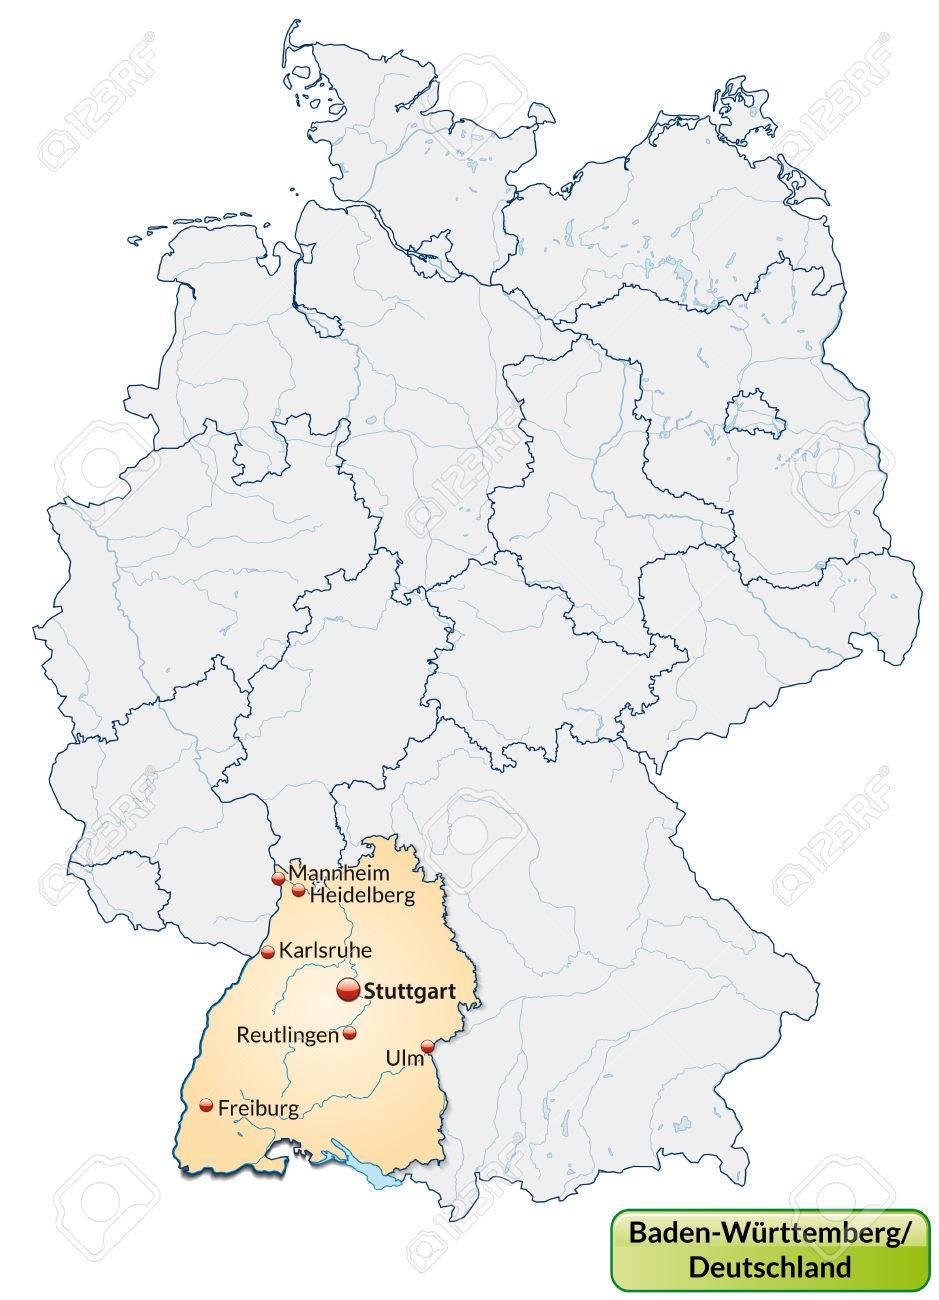 Karte baden württemberg städte in Städte des